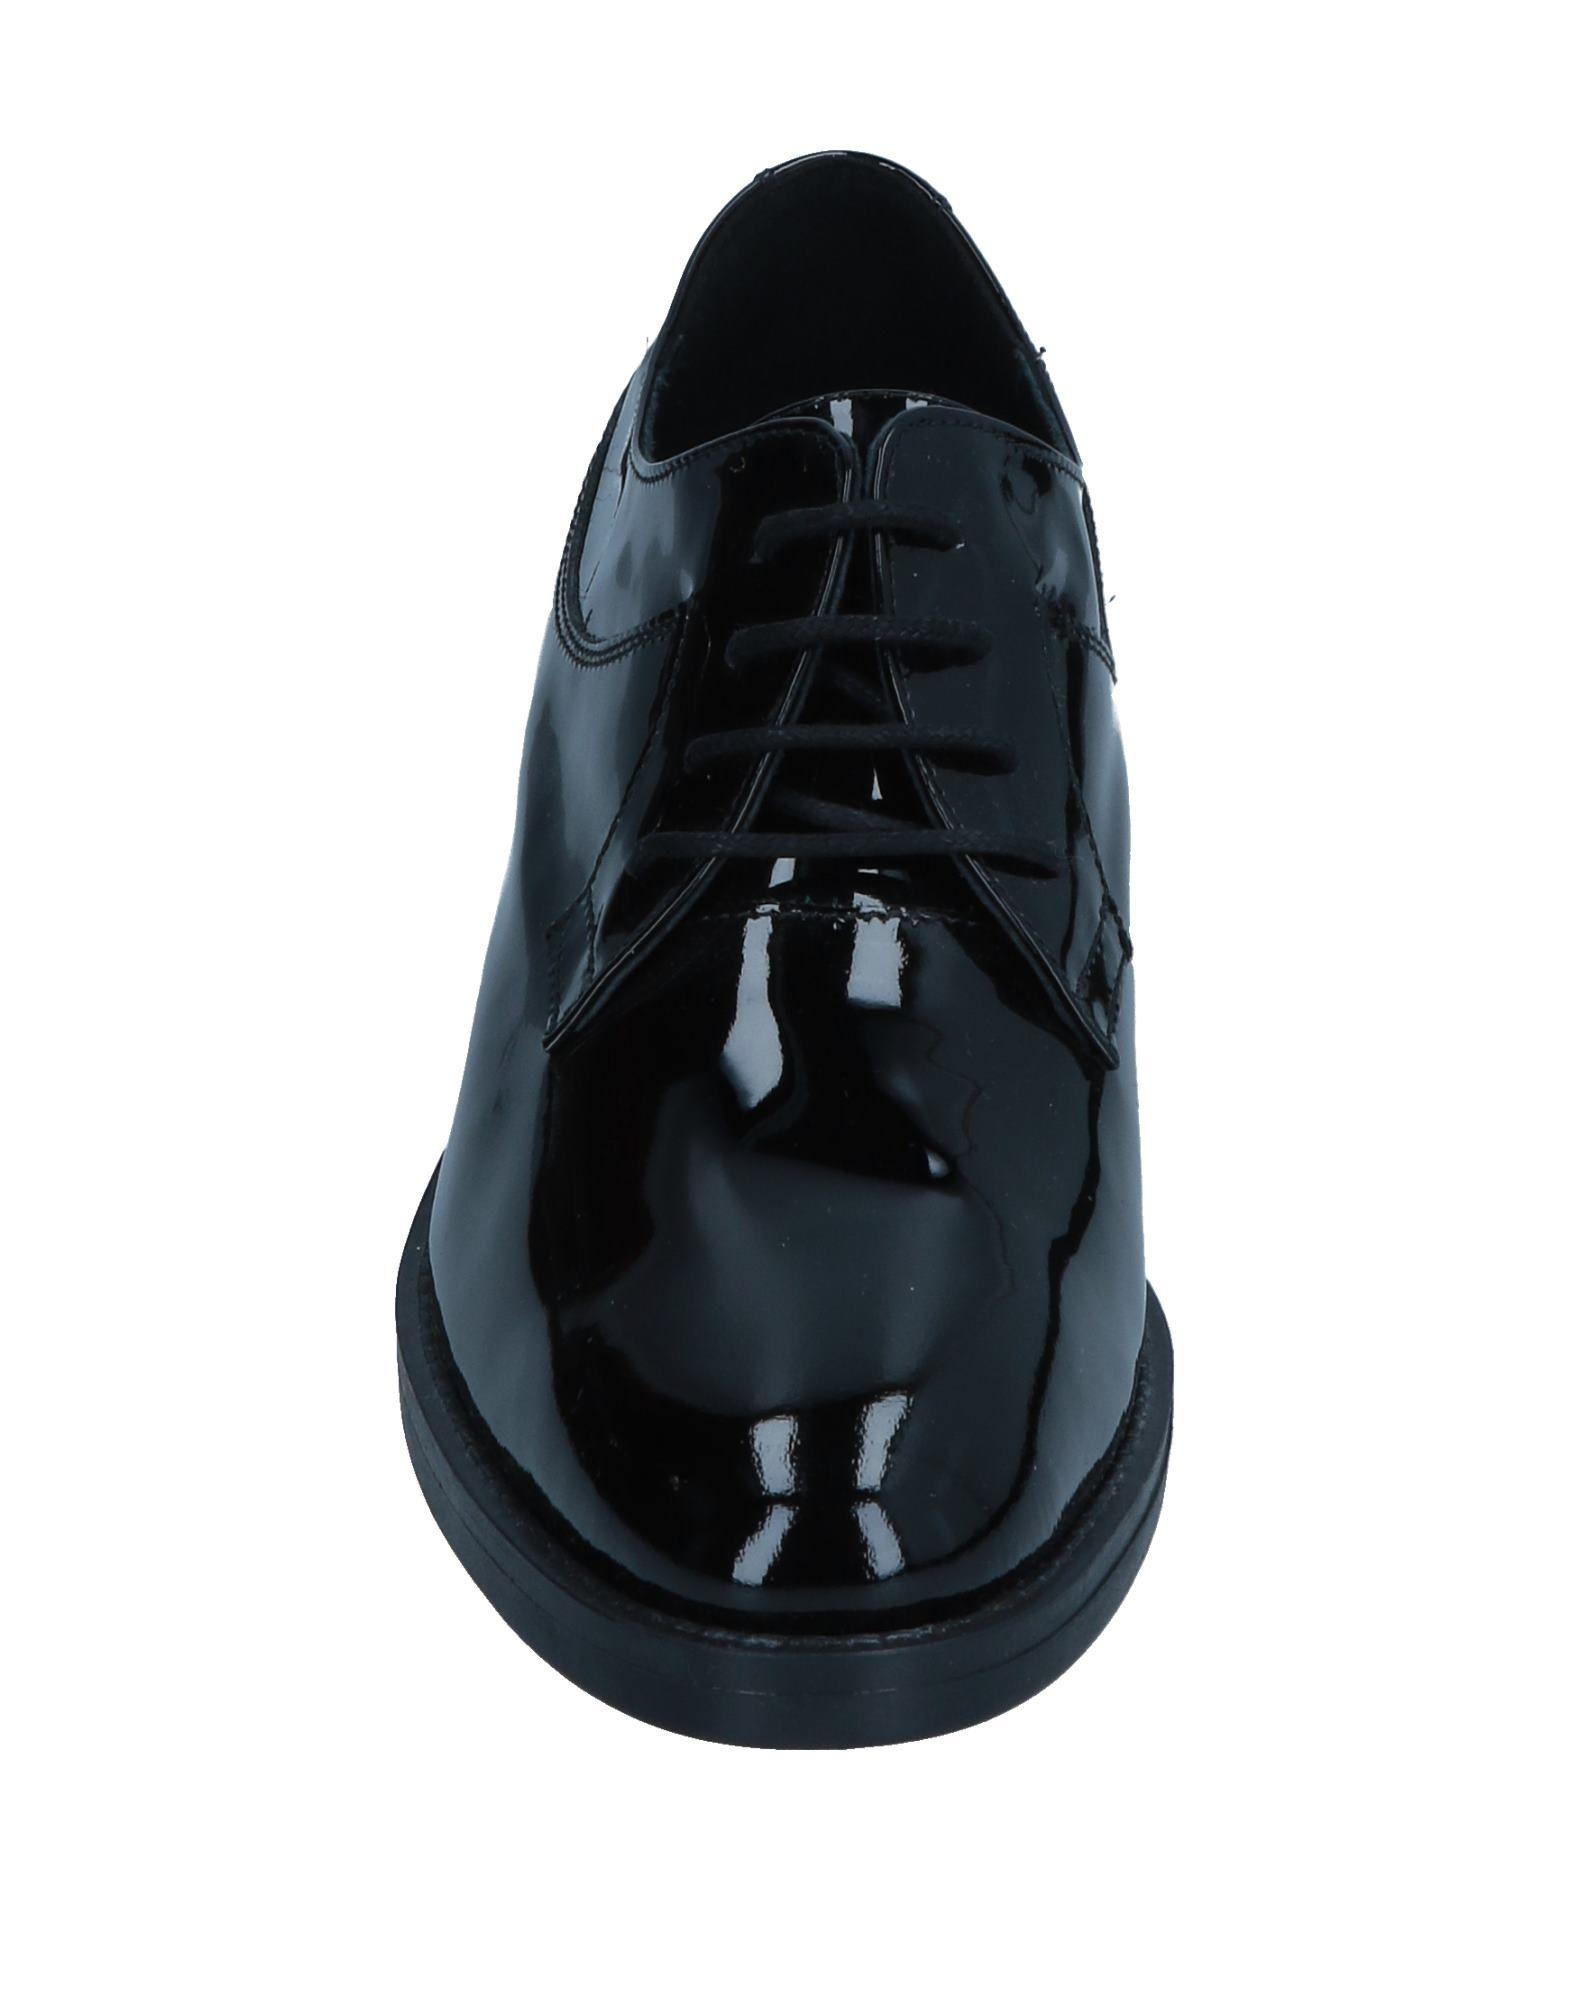 Donna Più Schnürschuhe Schuhe Damen  11544323CH Gute Qualität beliebte Schuhe Schnürschuhe 15c752